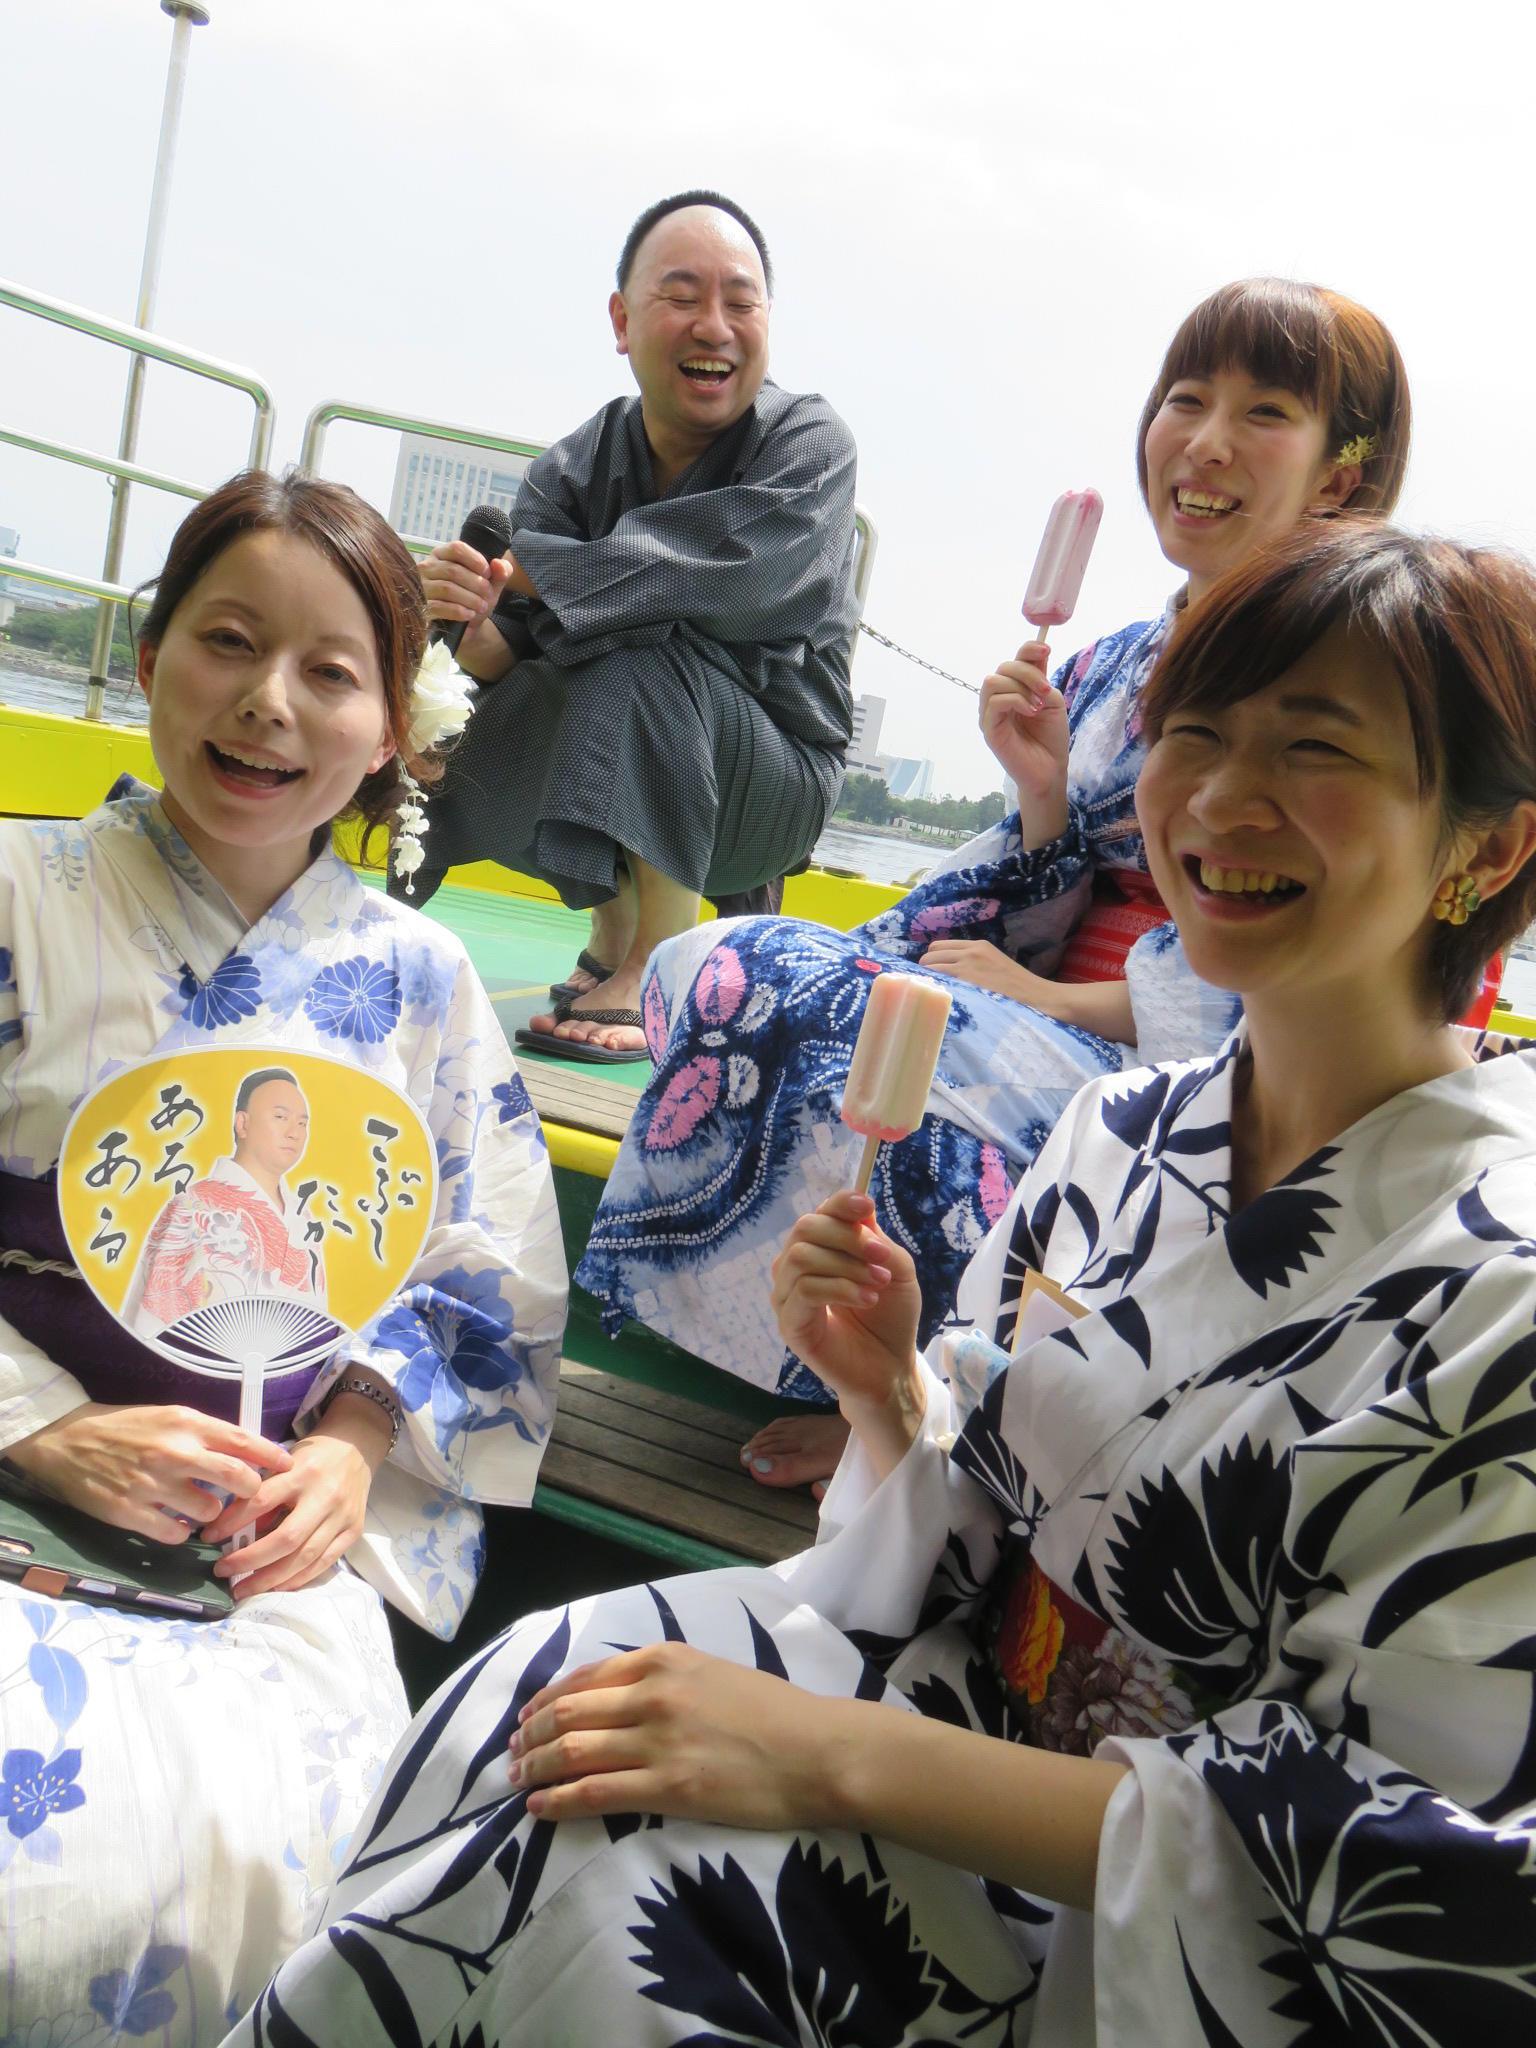 http://news.yoshimoto.co.jp/20170807130030-942750b7c2812fa6900e8668eac1192045bab16a.jpg